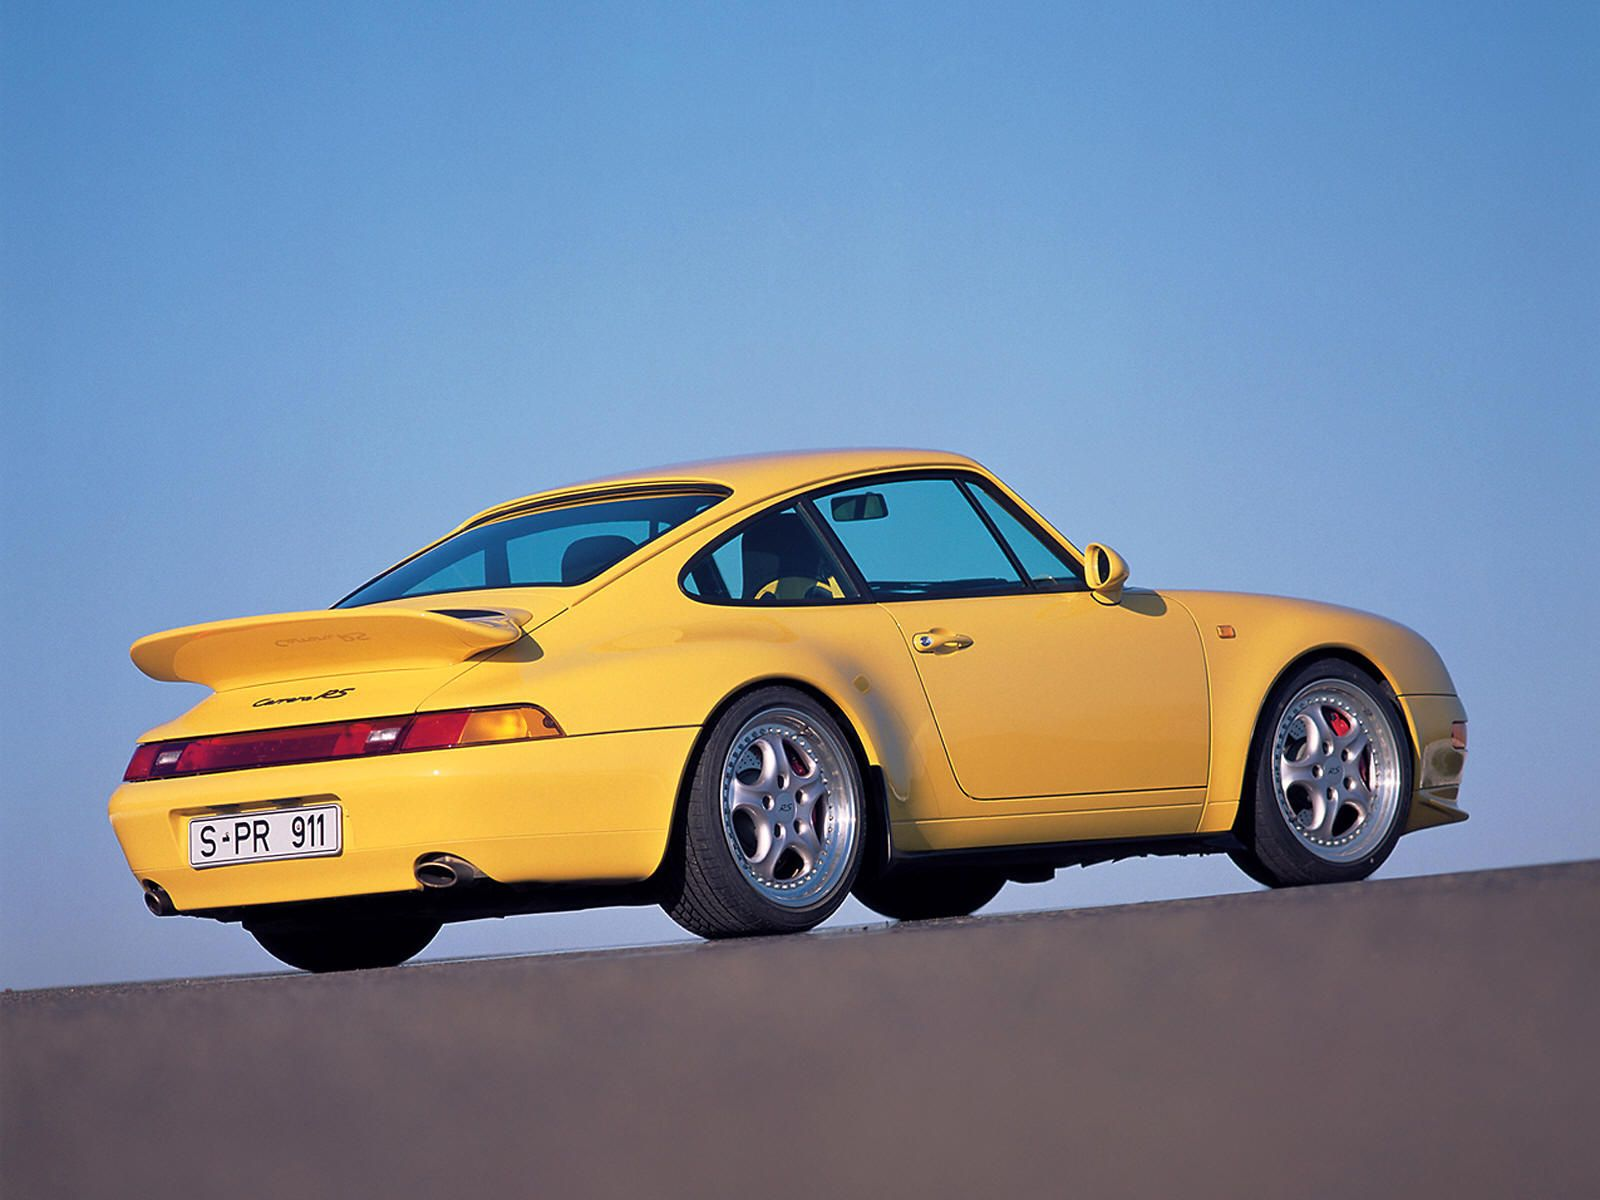 Porsche 993 Pastel Yellow 1995 Porsche 911 Porsche 993 Porsche 911